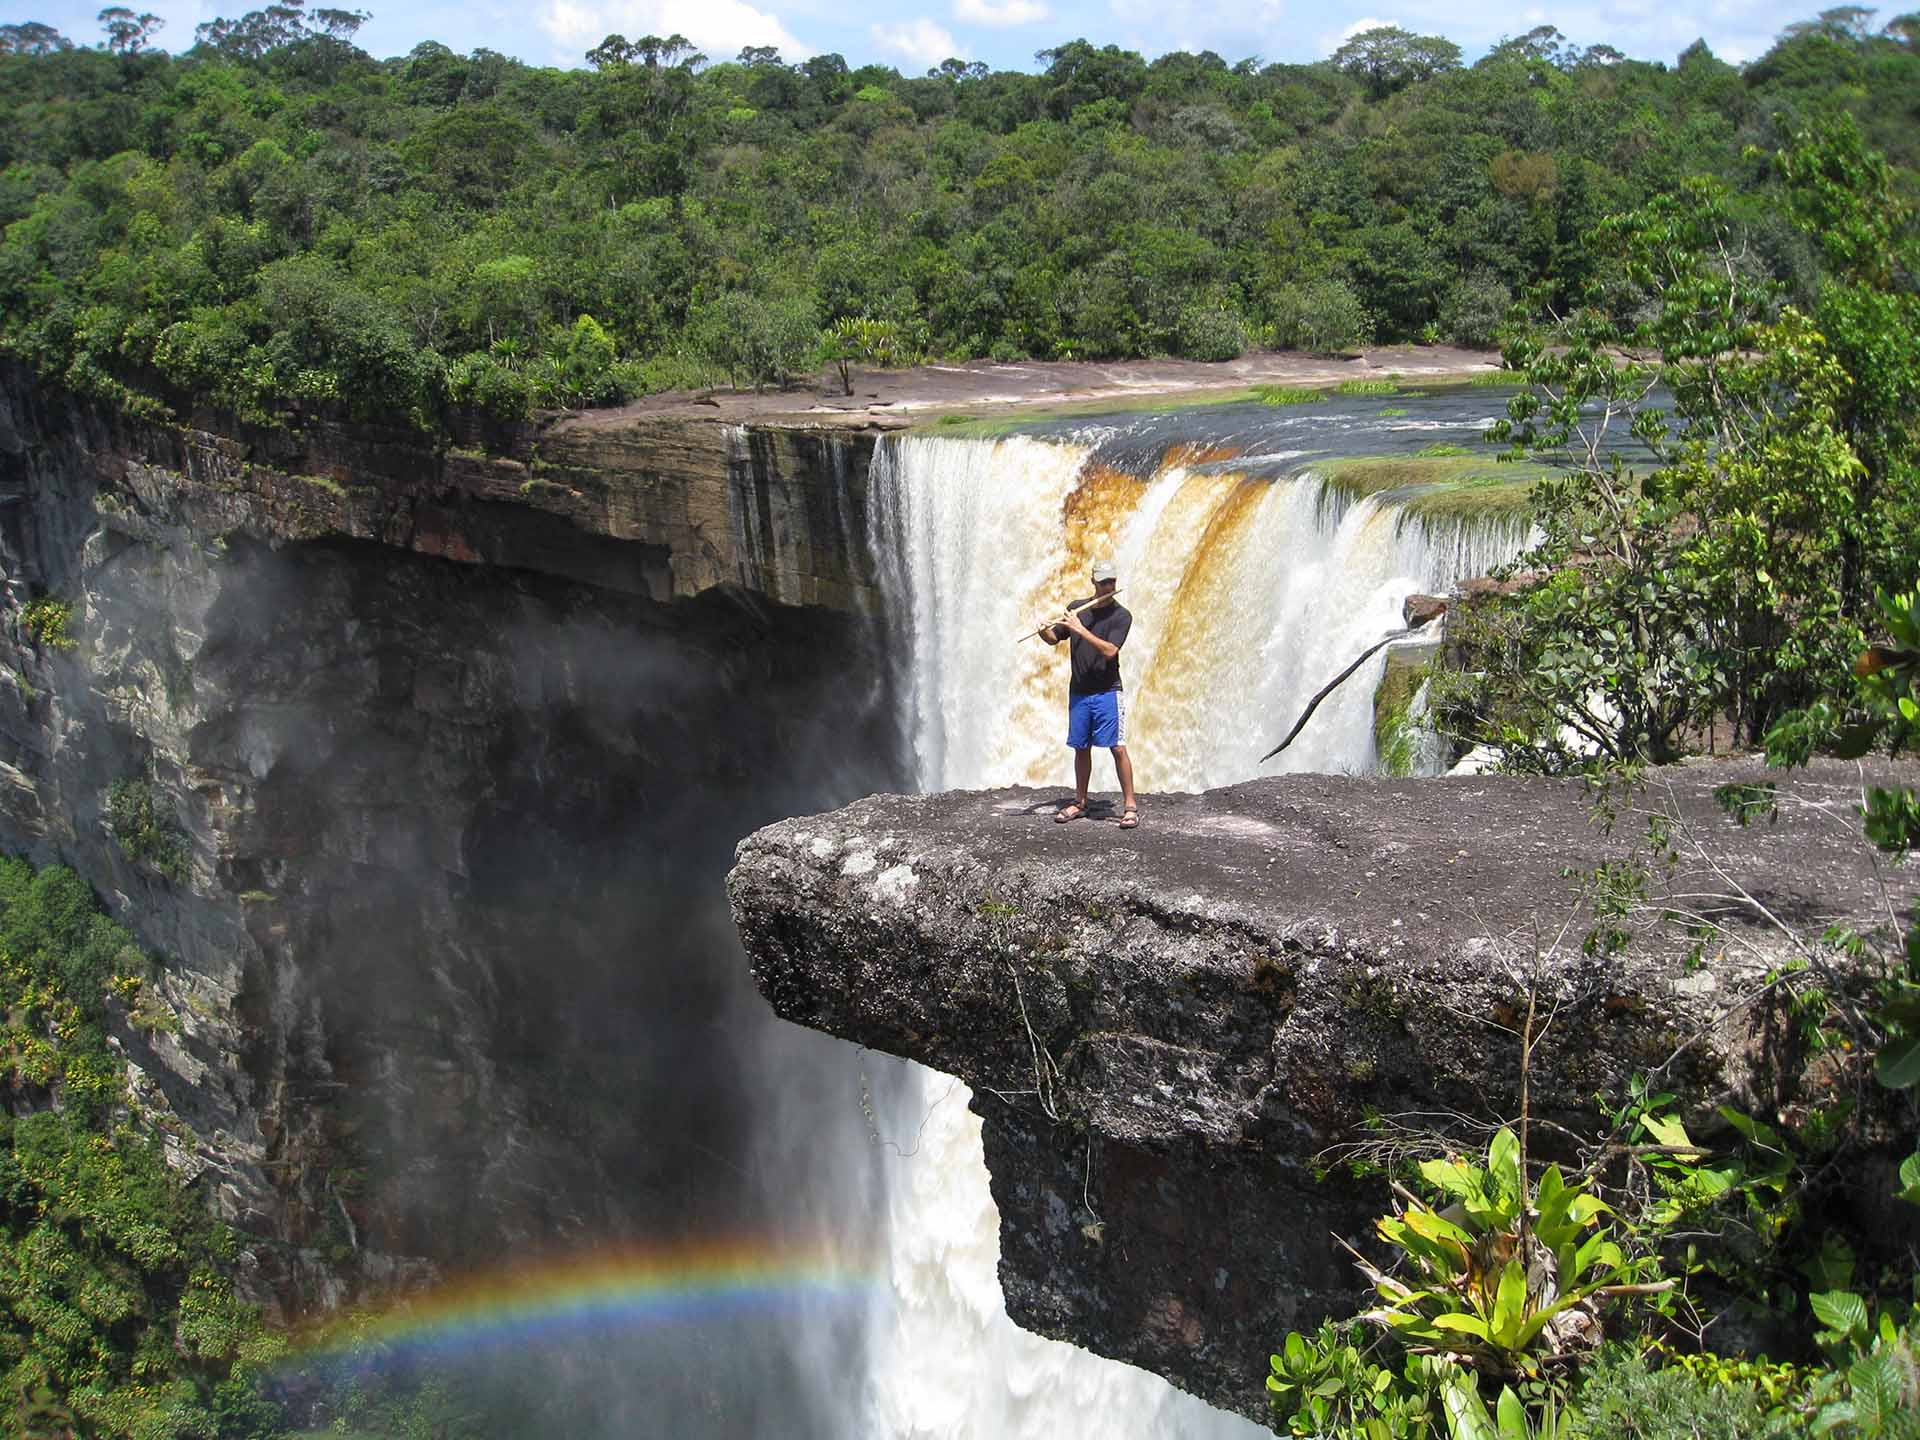 Guyana - Kerry Kriger Bansuri Bamboo Flute Kaieteur Falls 2008-1920